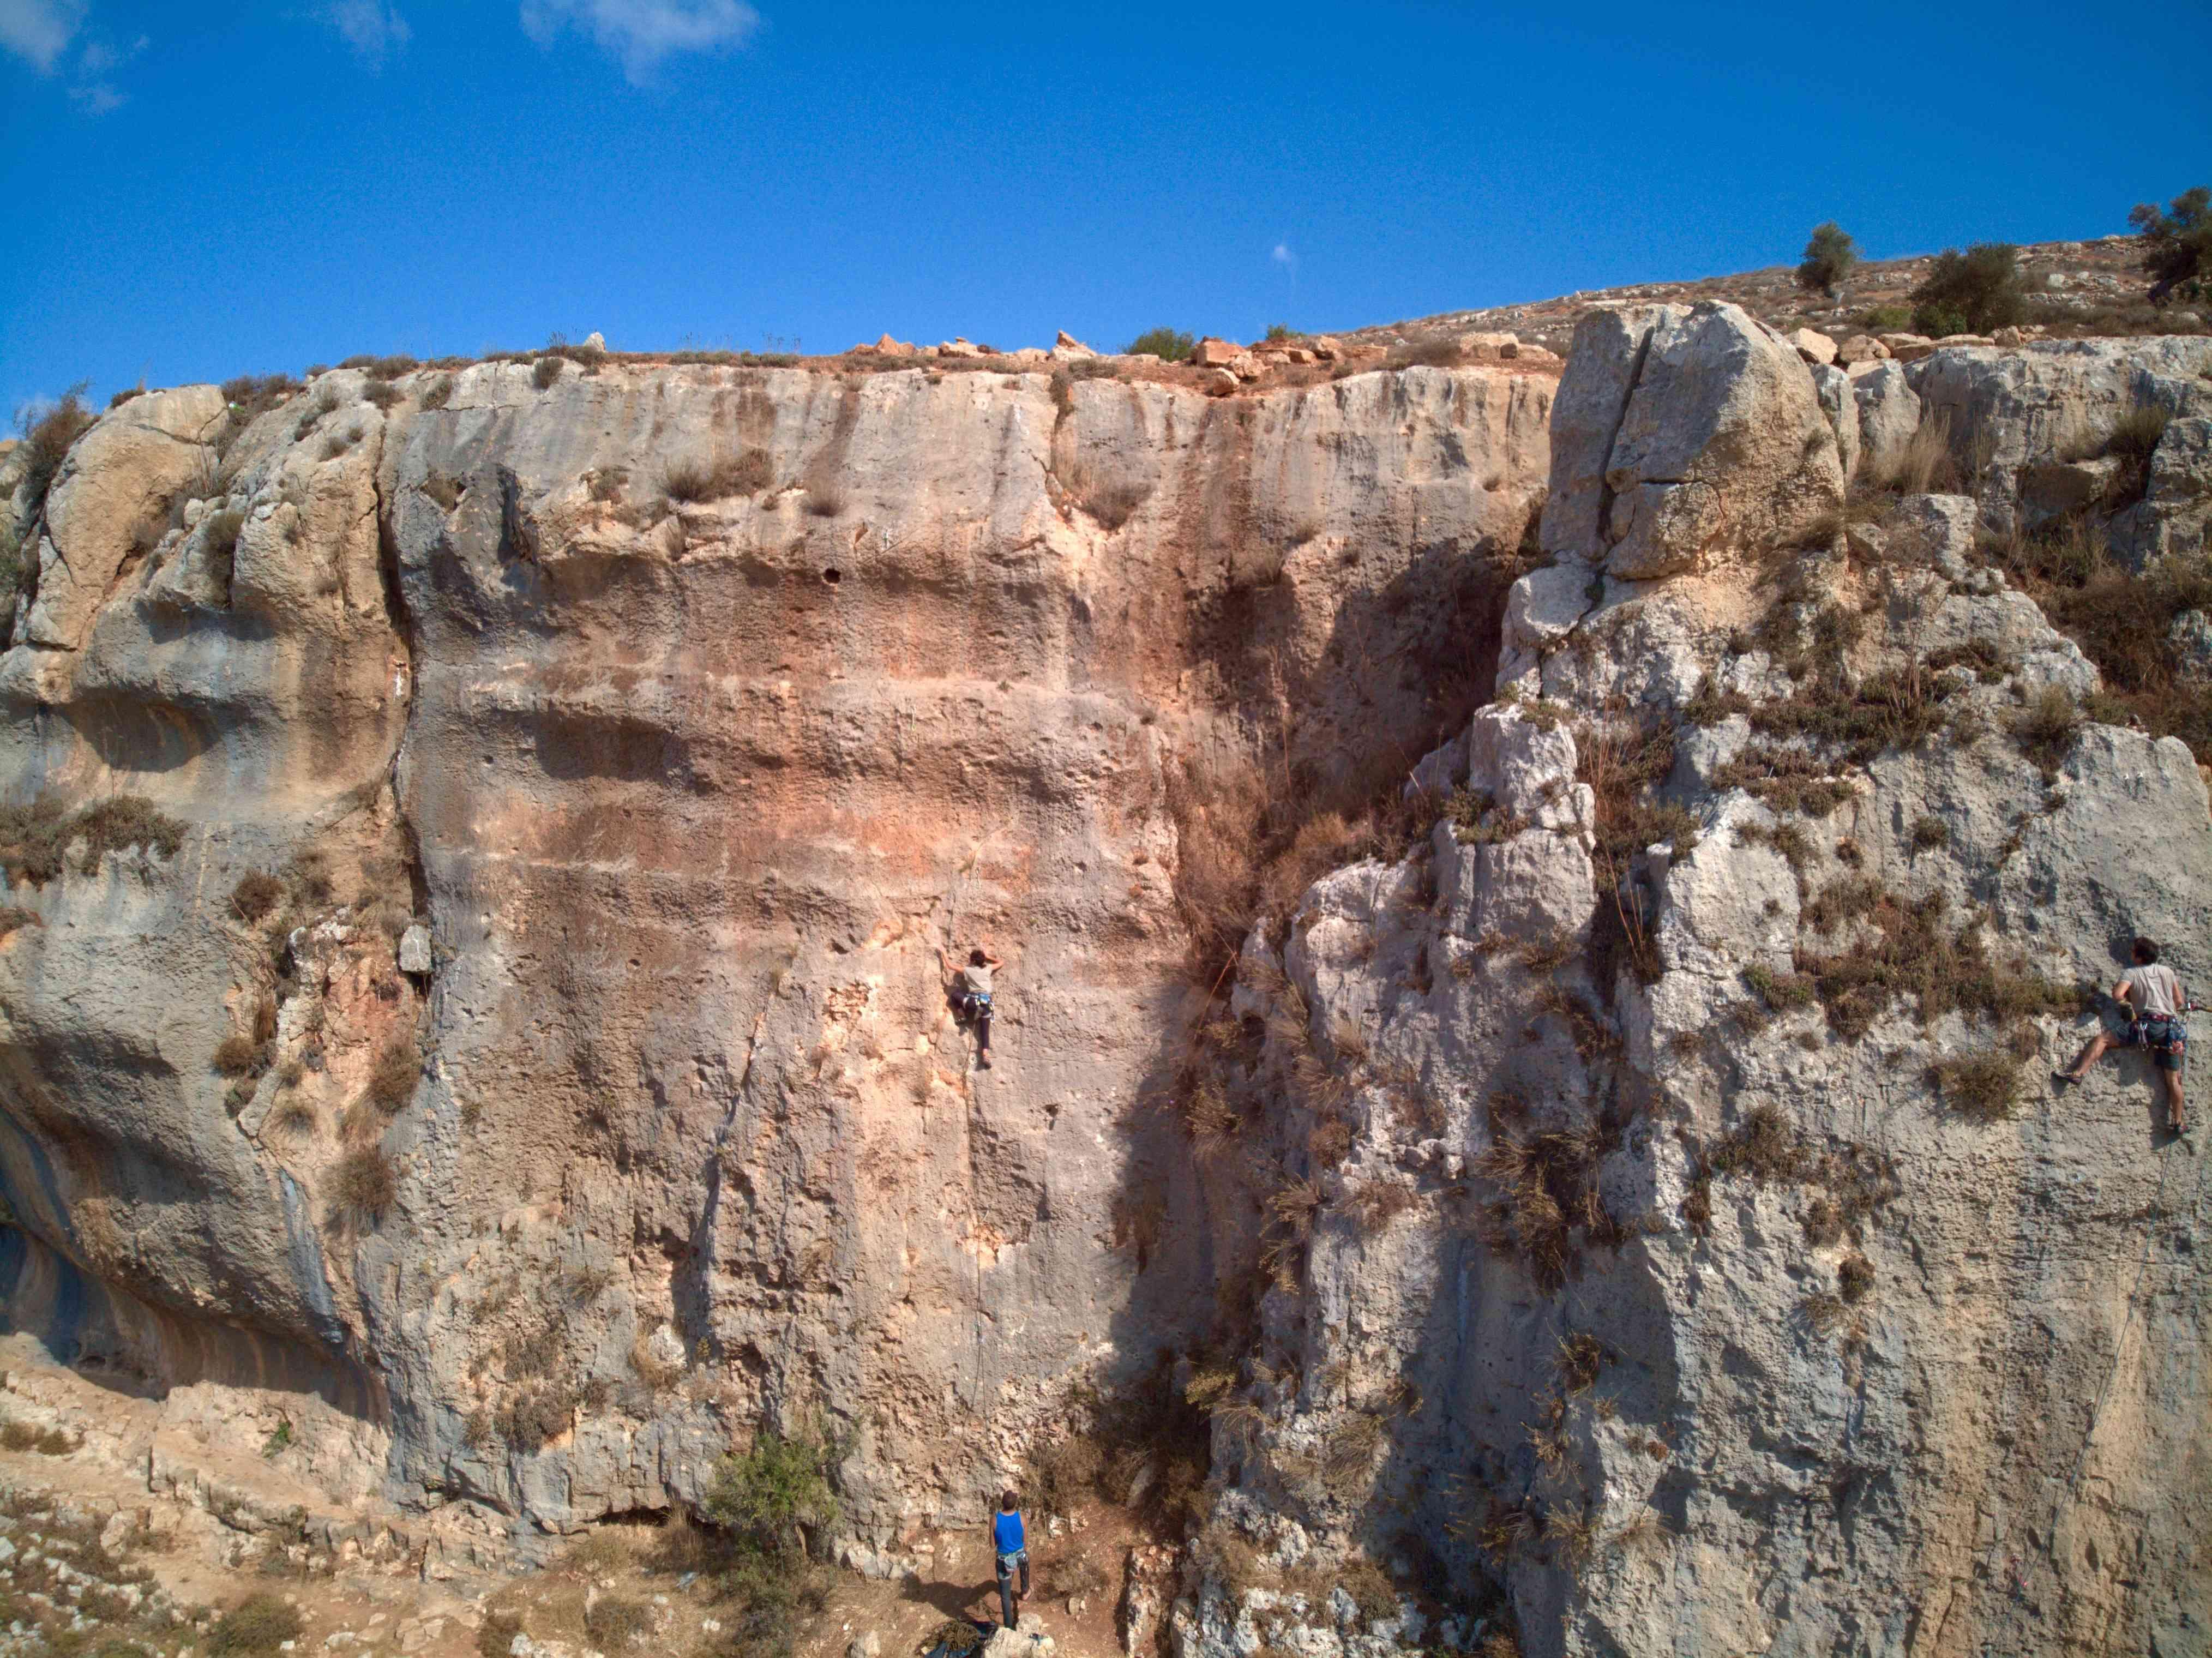 Inas Radaydeh rock climbing Palestine